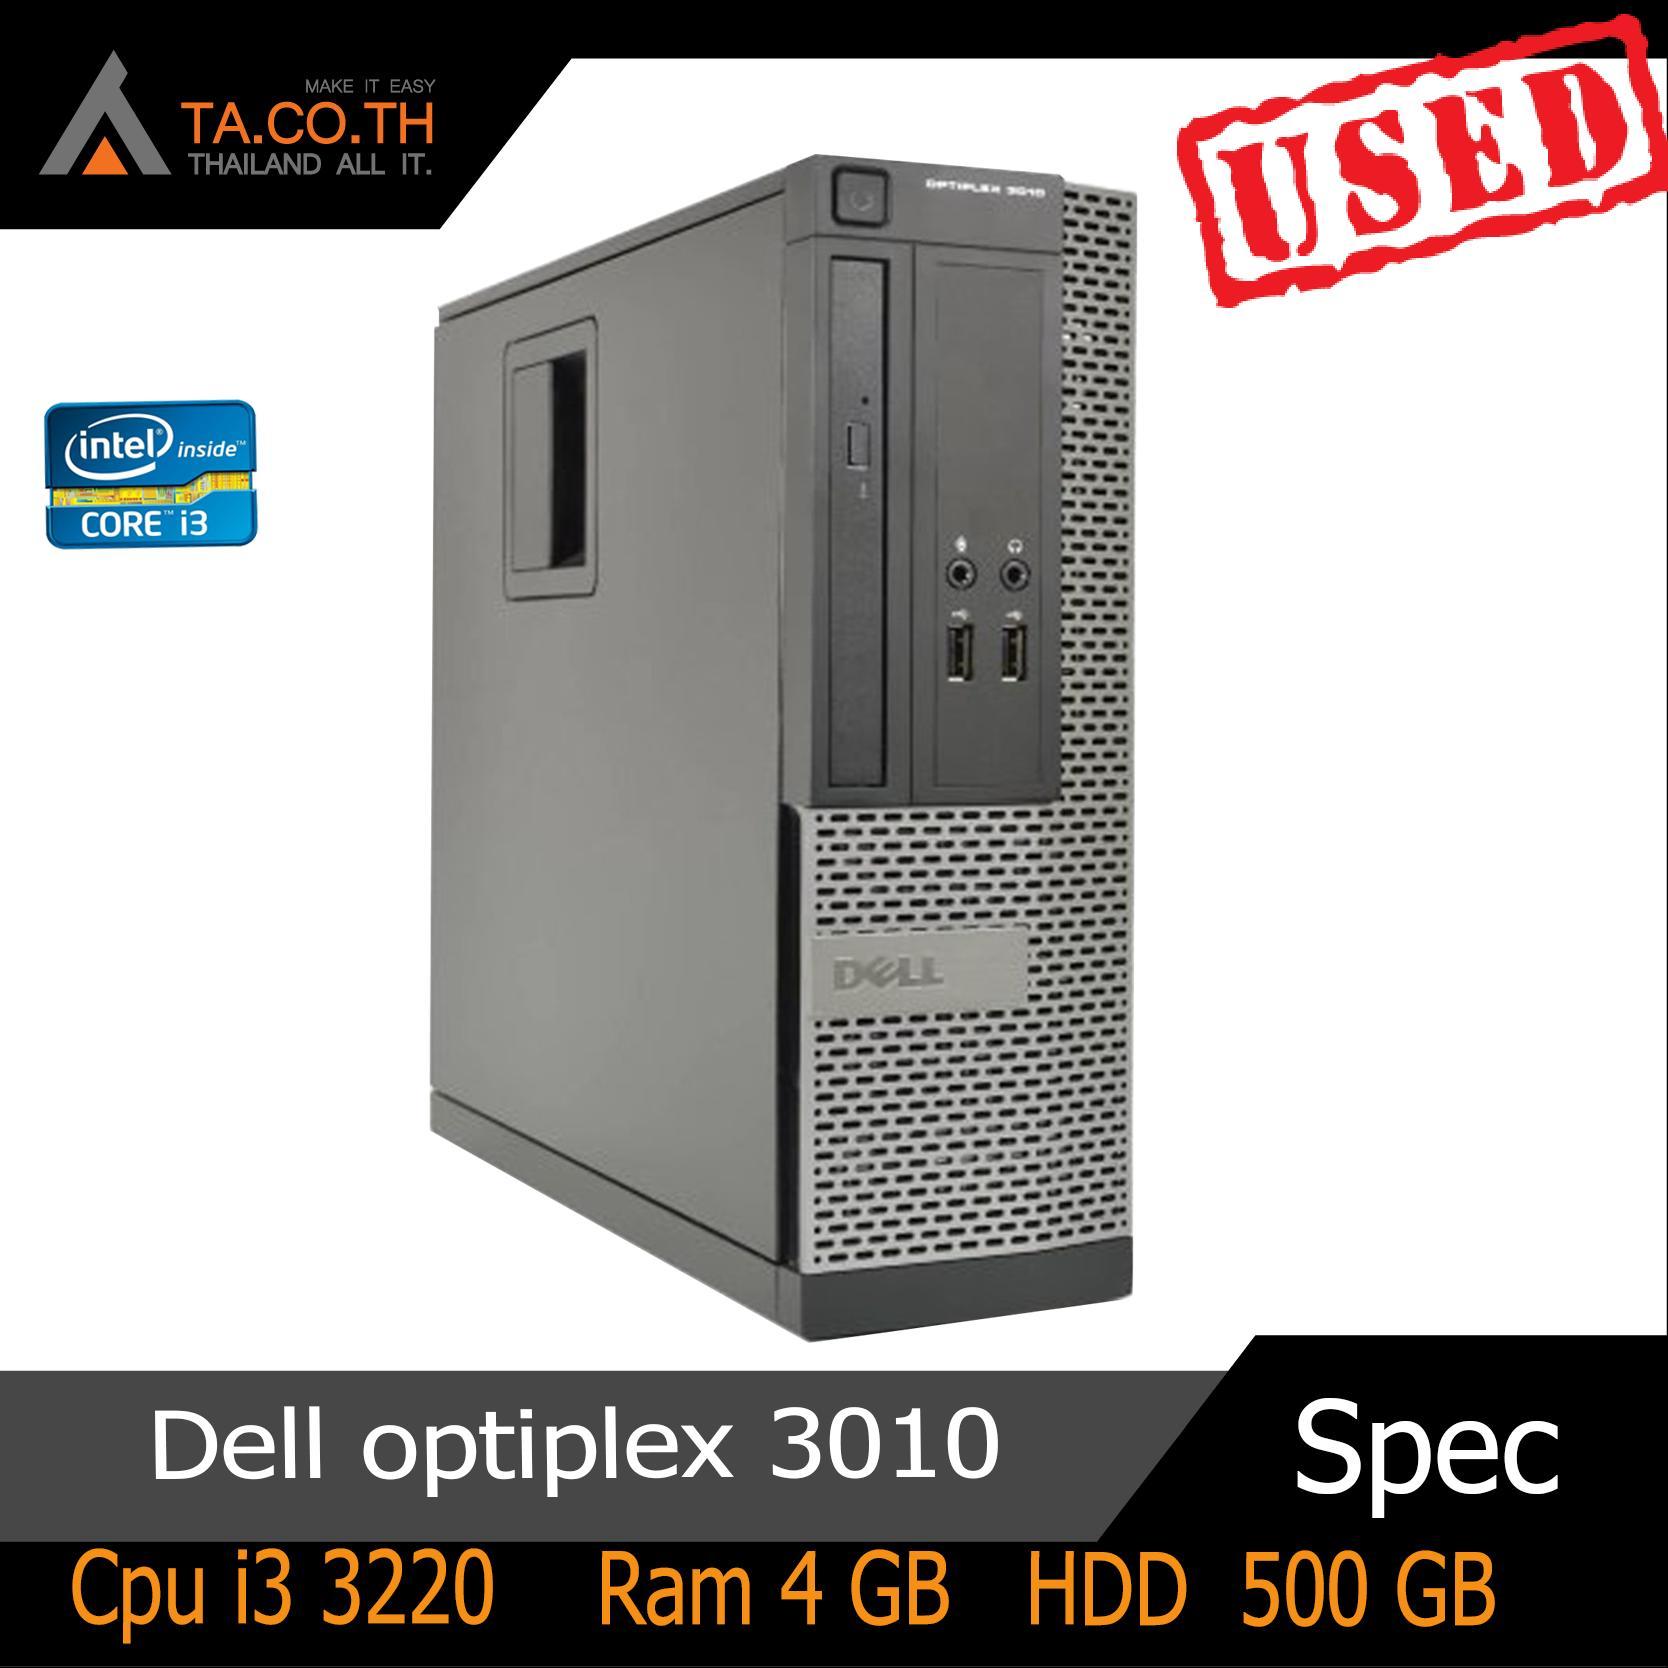 Dell optiplex 3010 เหมาะสำรับใช้งานออฟฟิตทั่วไป